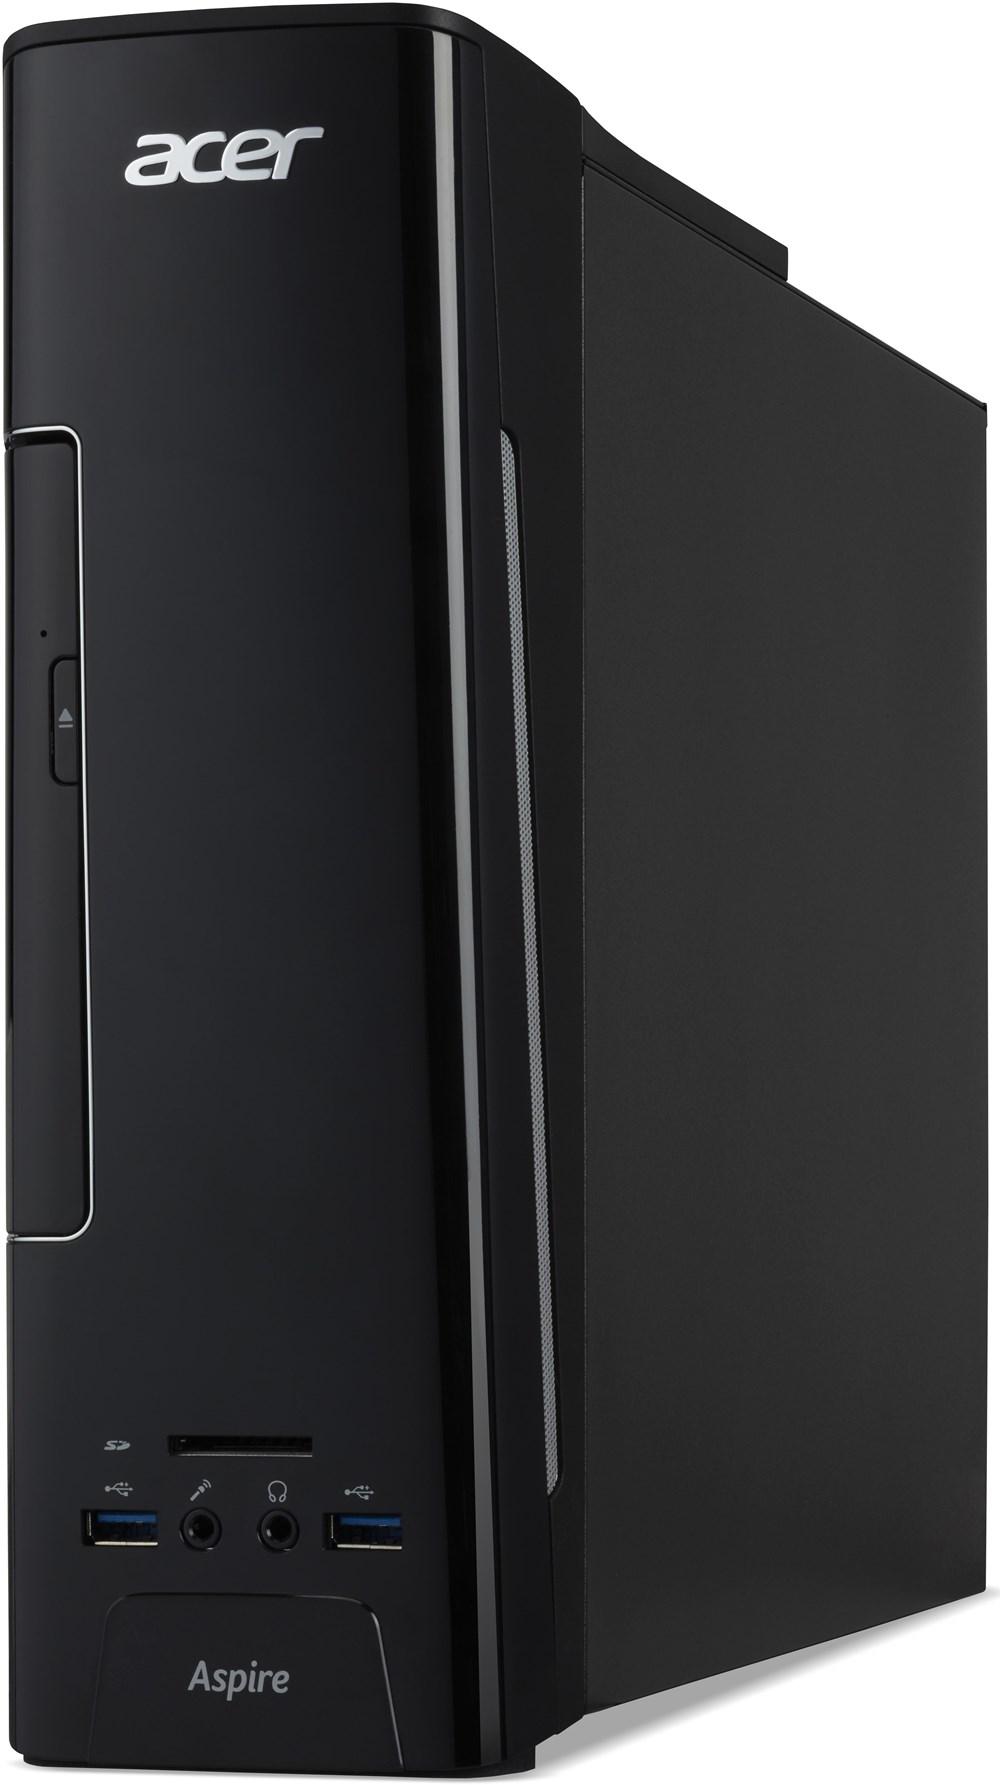 Acer Aspire XC-780 SFF DT.B5EEG.036 ohne Betriebssystem